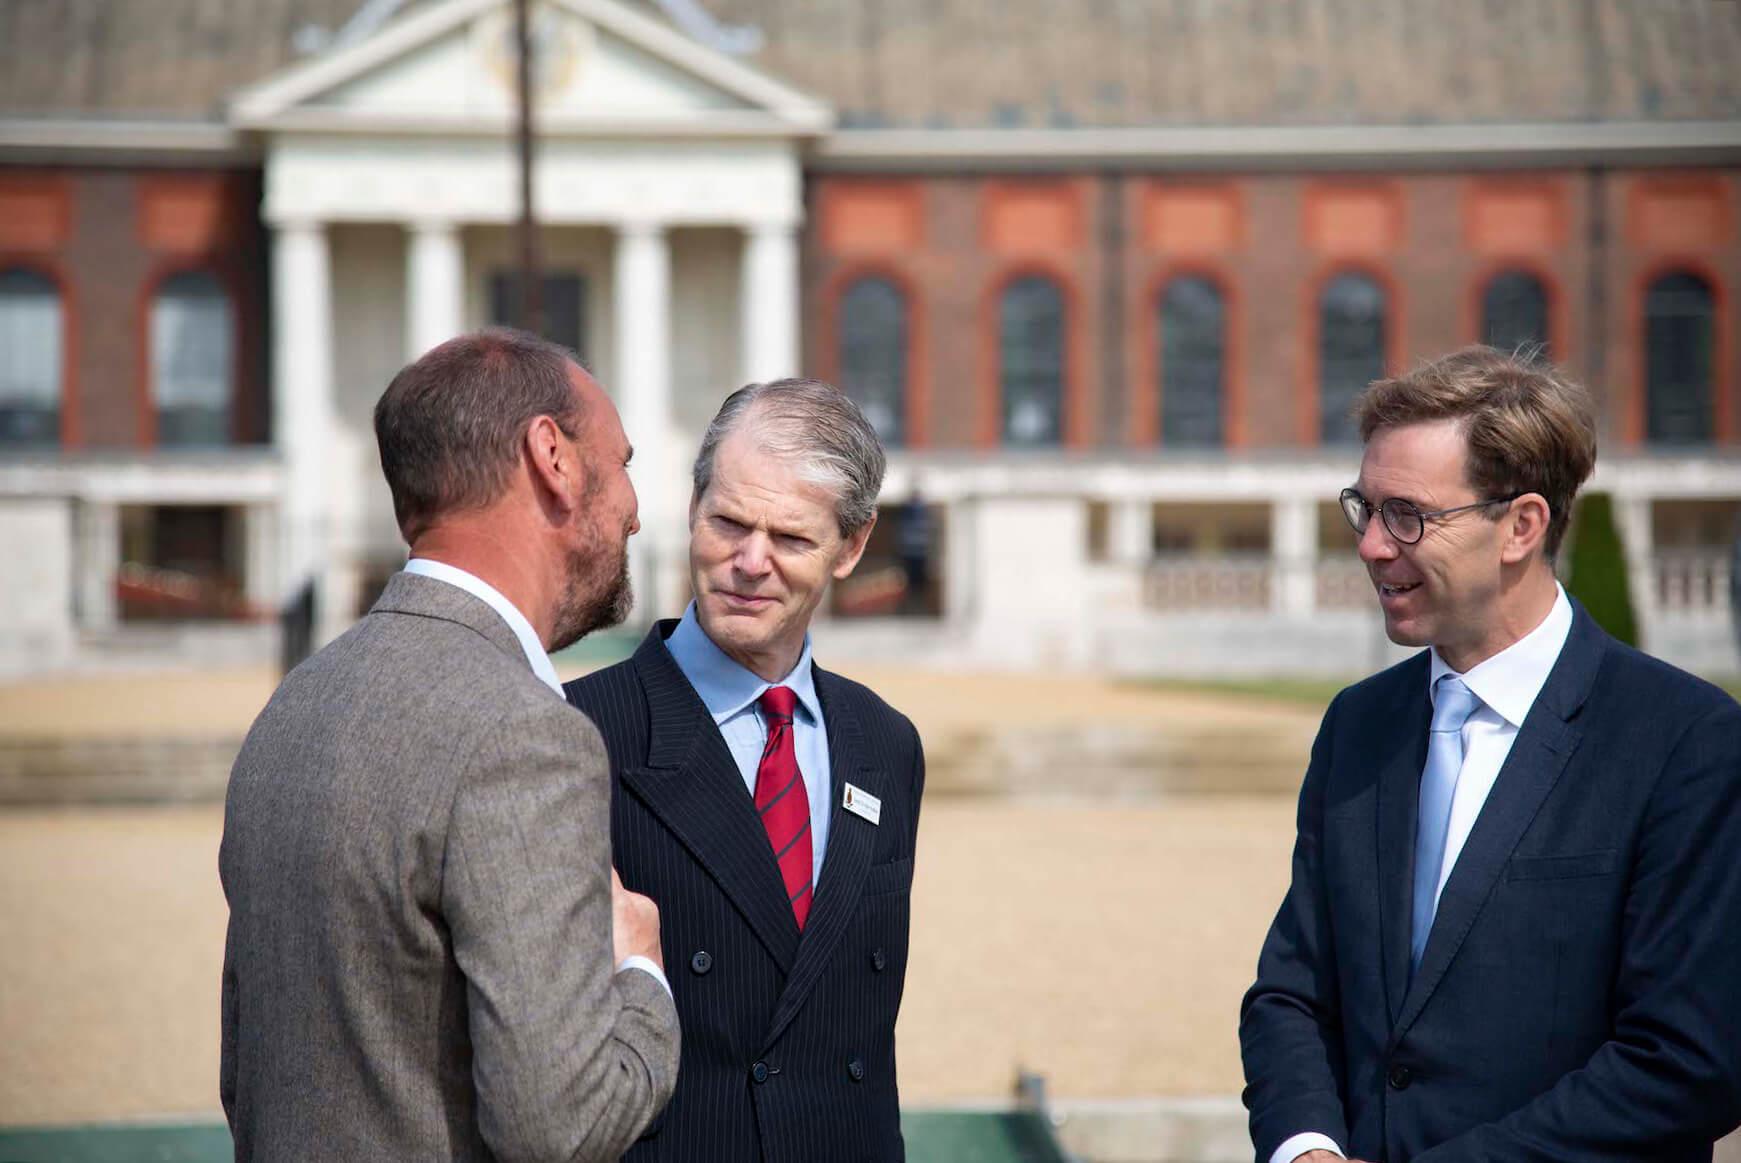 MP Tobias Ellwood meets General Sir Adrian Bradshaw